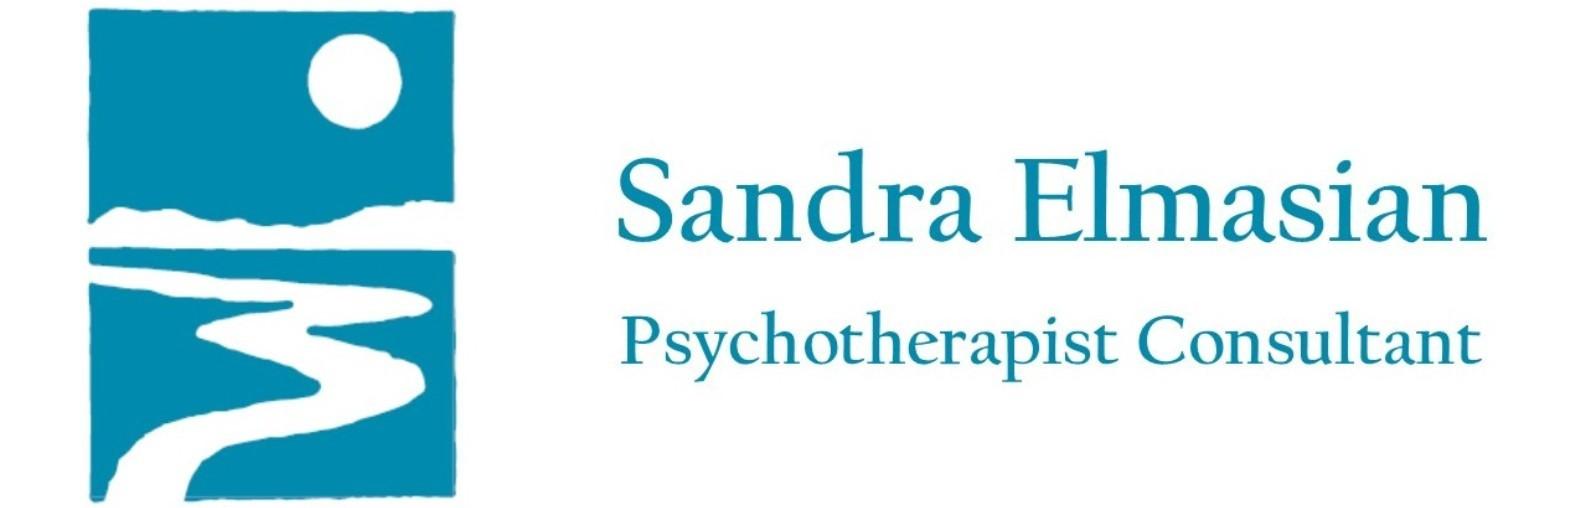 Sandra Elmasian Retina Logo